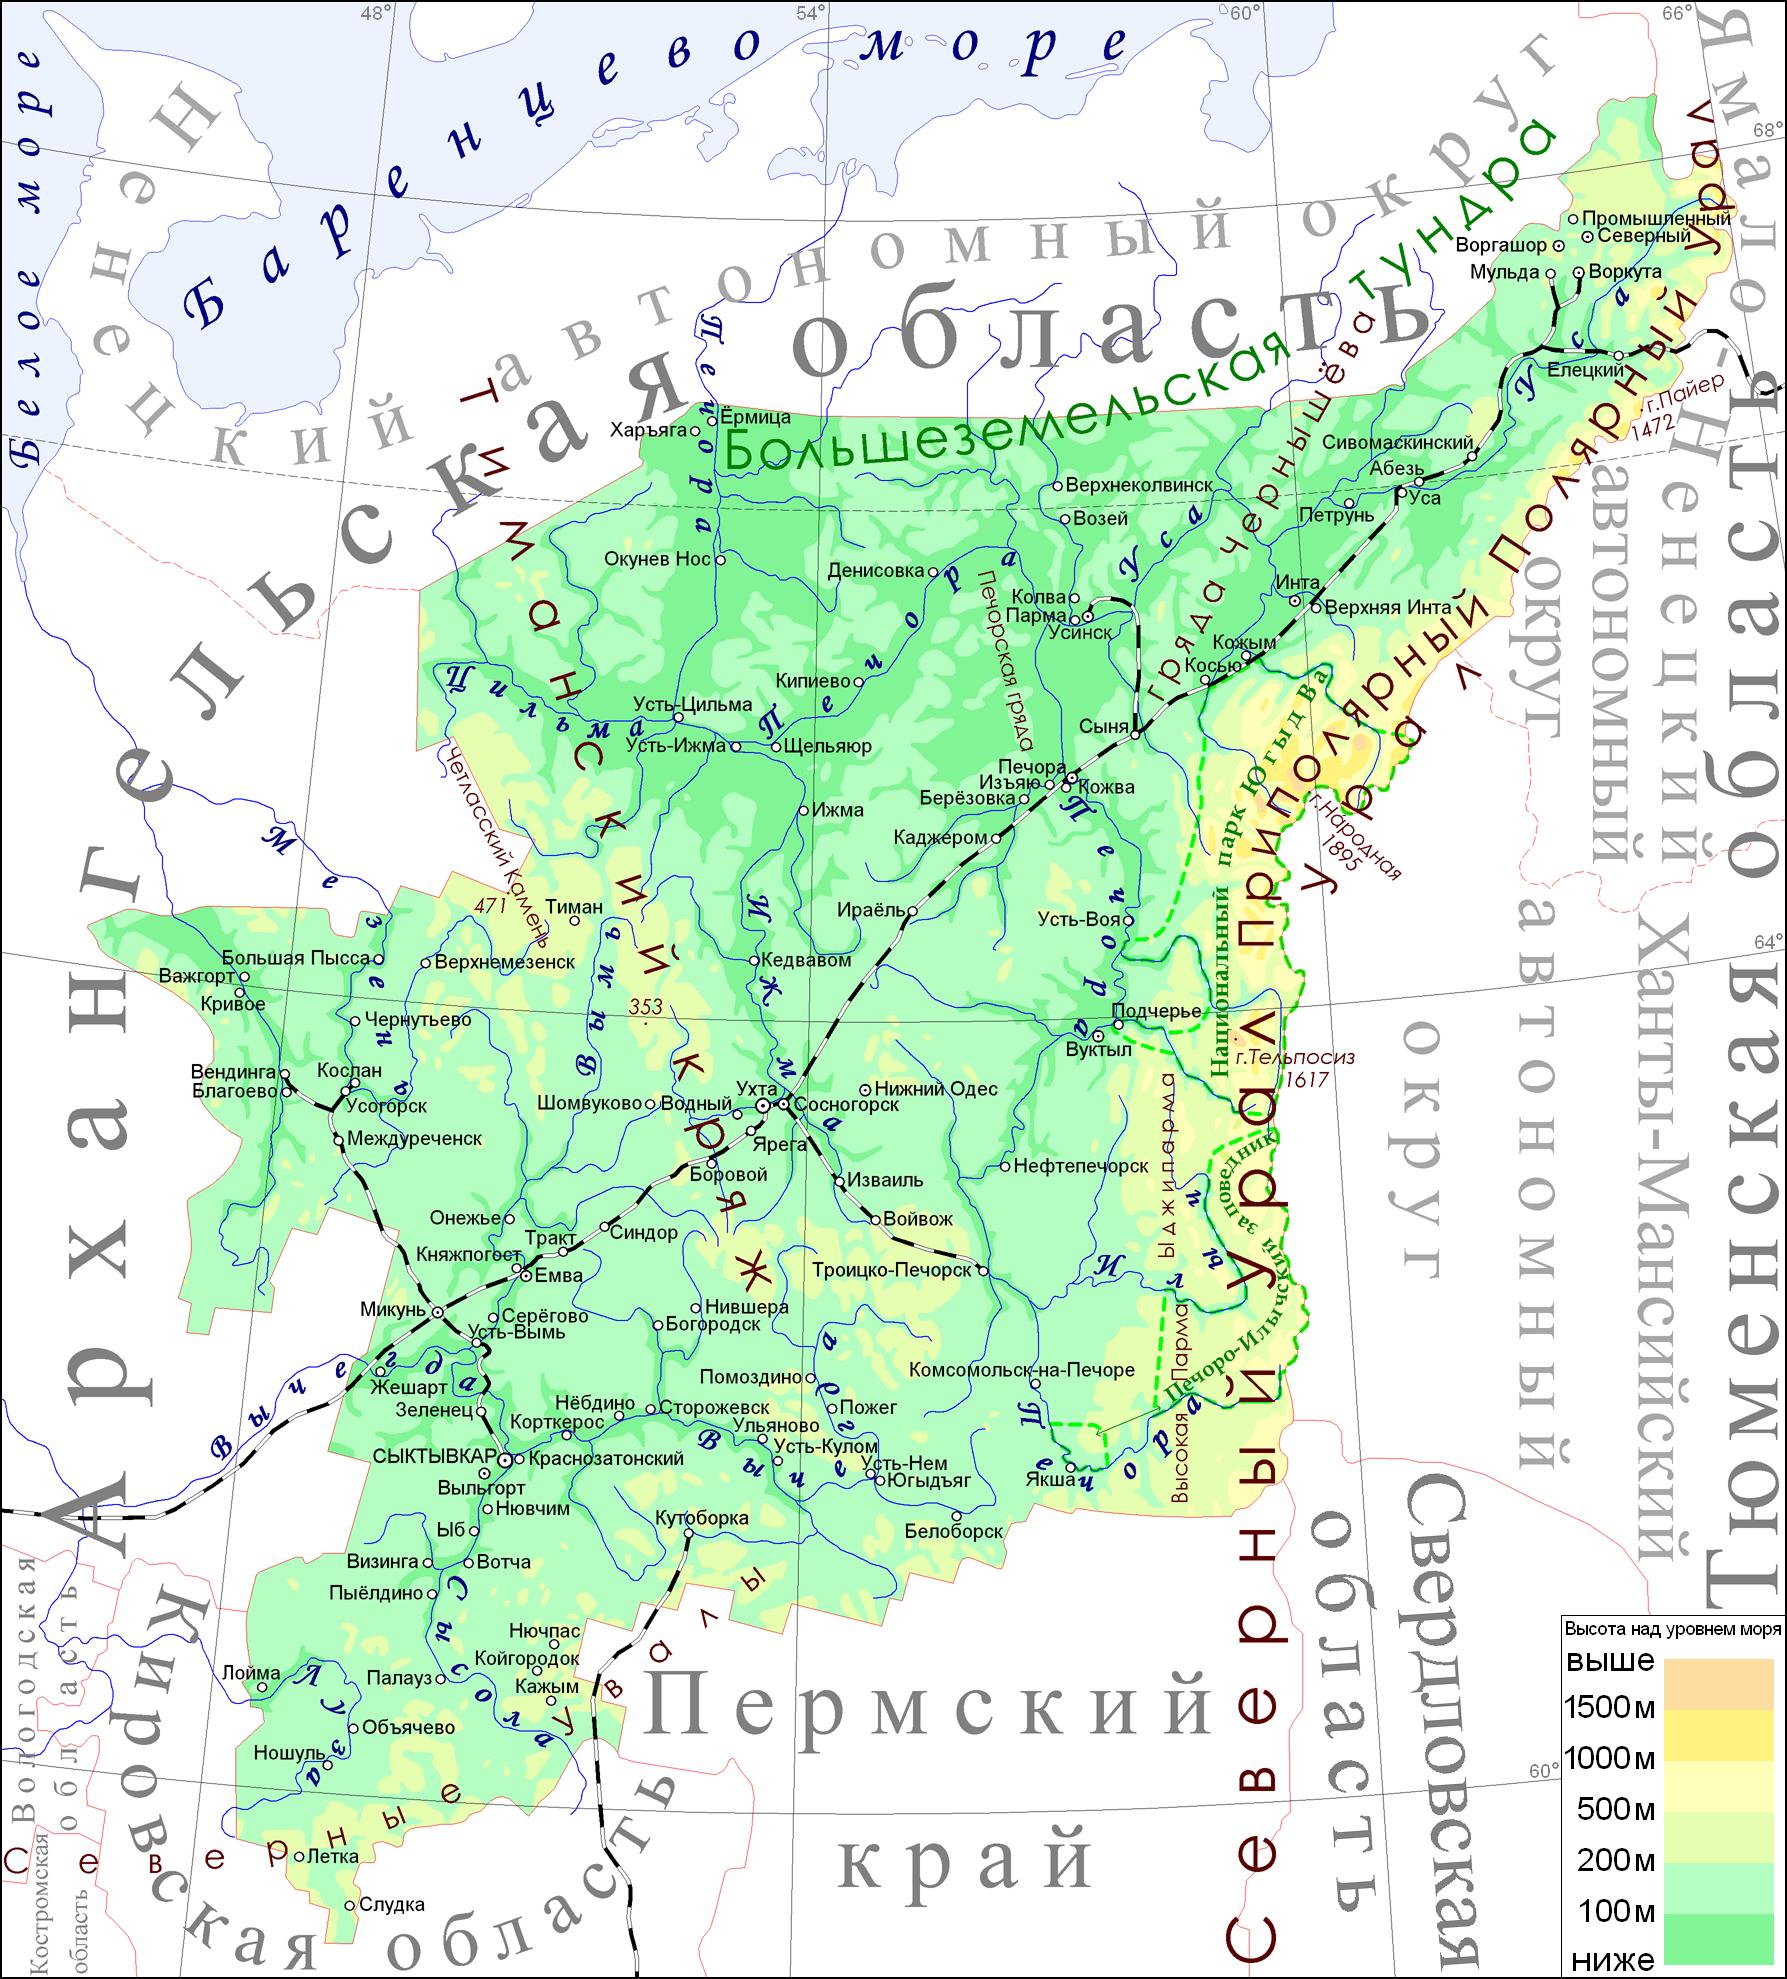 Карты городов Республики Коми: http://haveall.net/karty-gorodov-respubliki-komi/